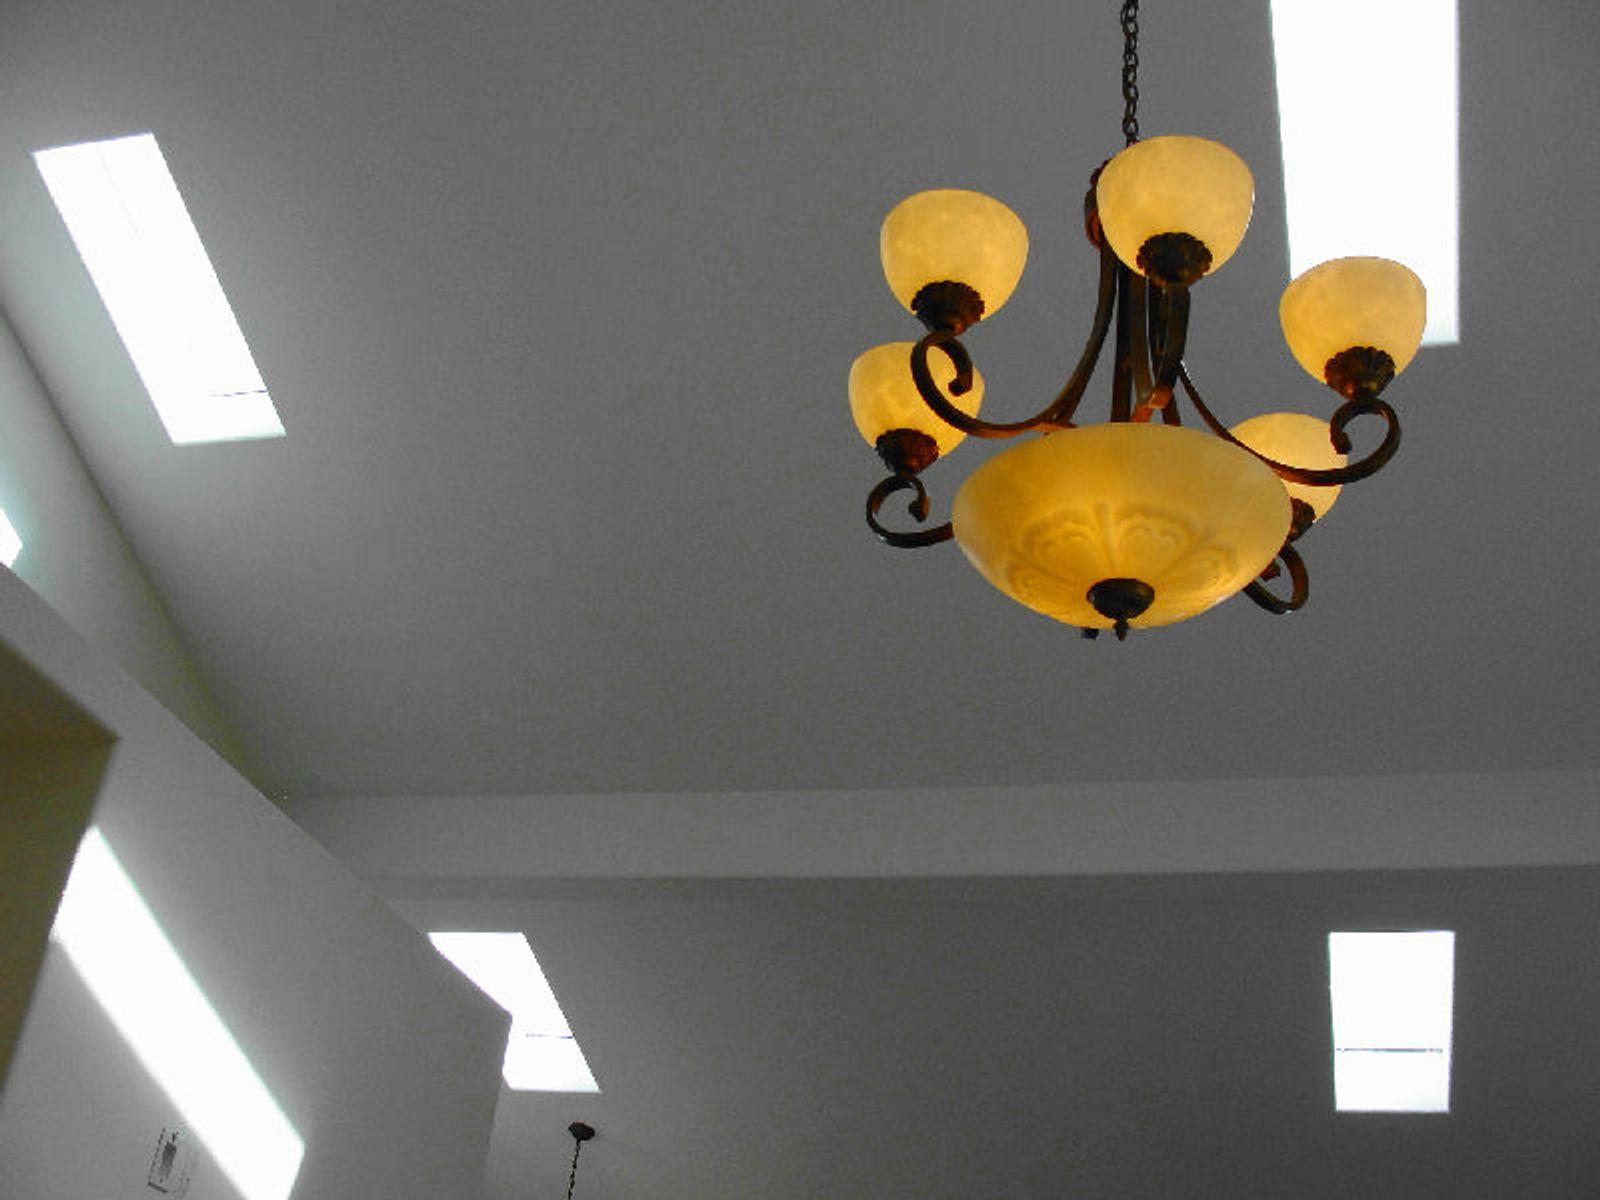 Skylights and chandelier illuminate dining room.